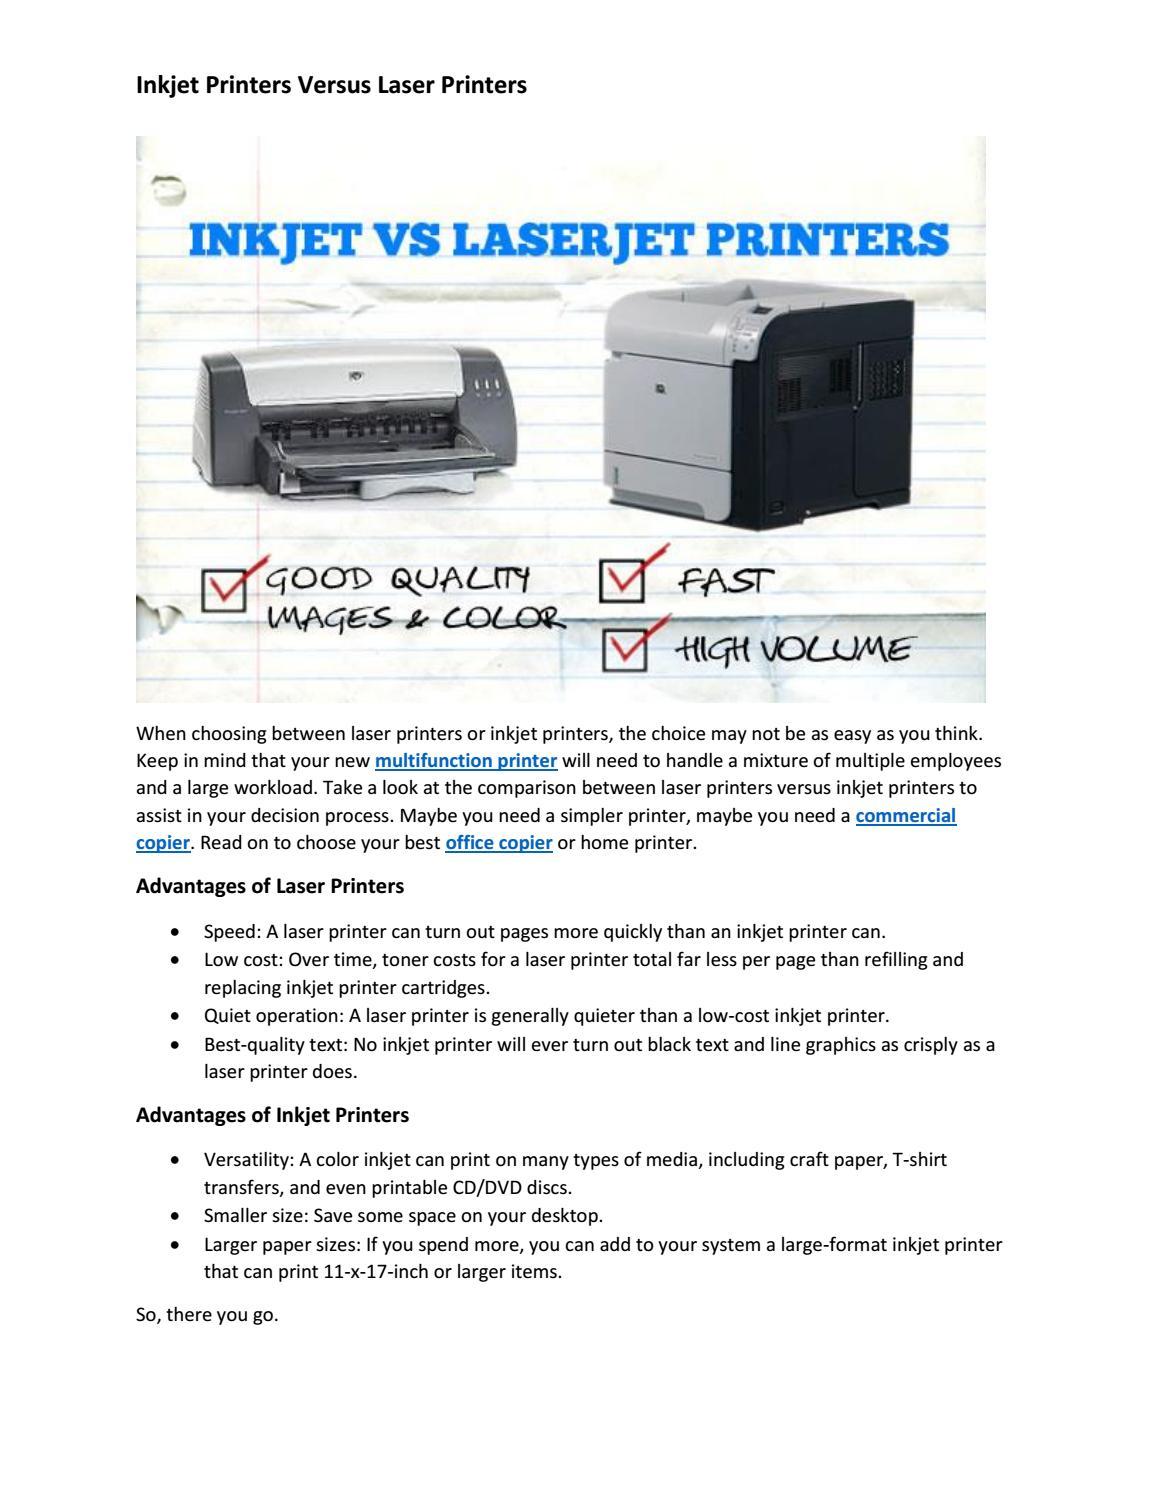 T Shirt Printing Paper For Laser Printers - DREAMWORKS